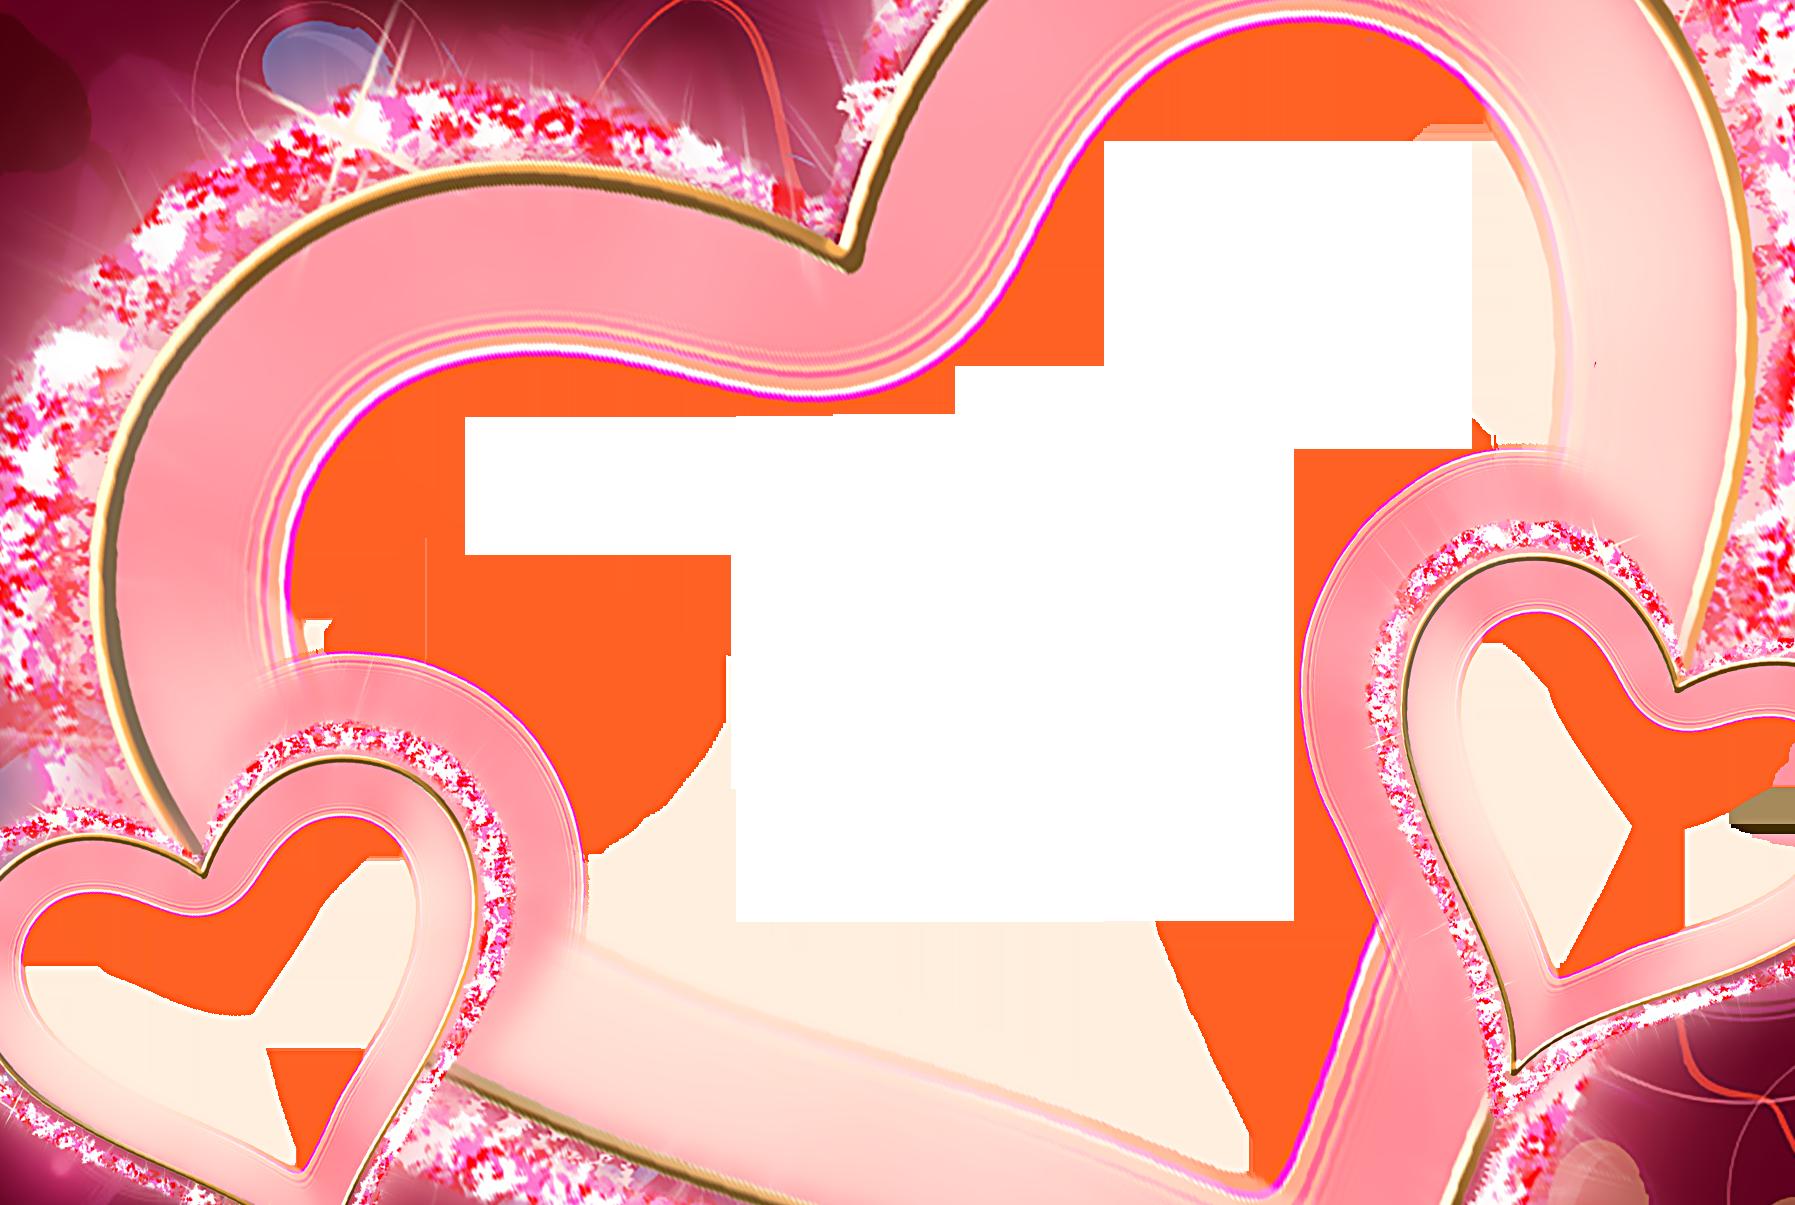 download Love Collage Picture Frames wallpaperdesktop background 1795x1205